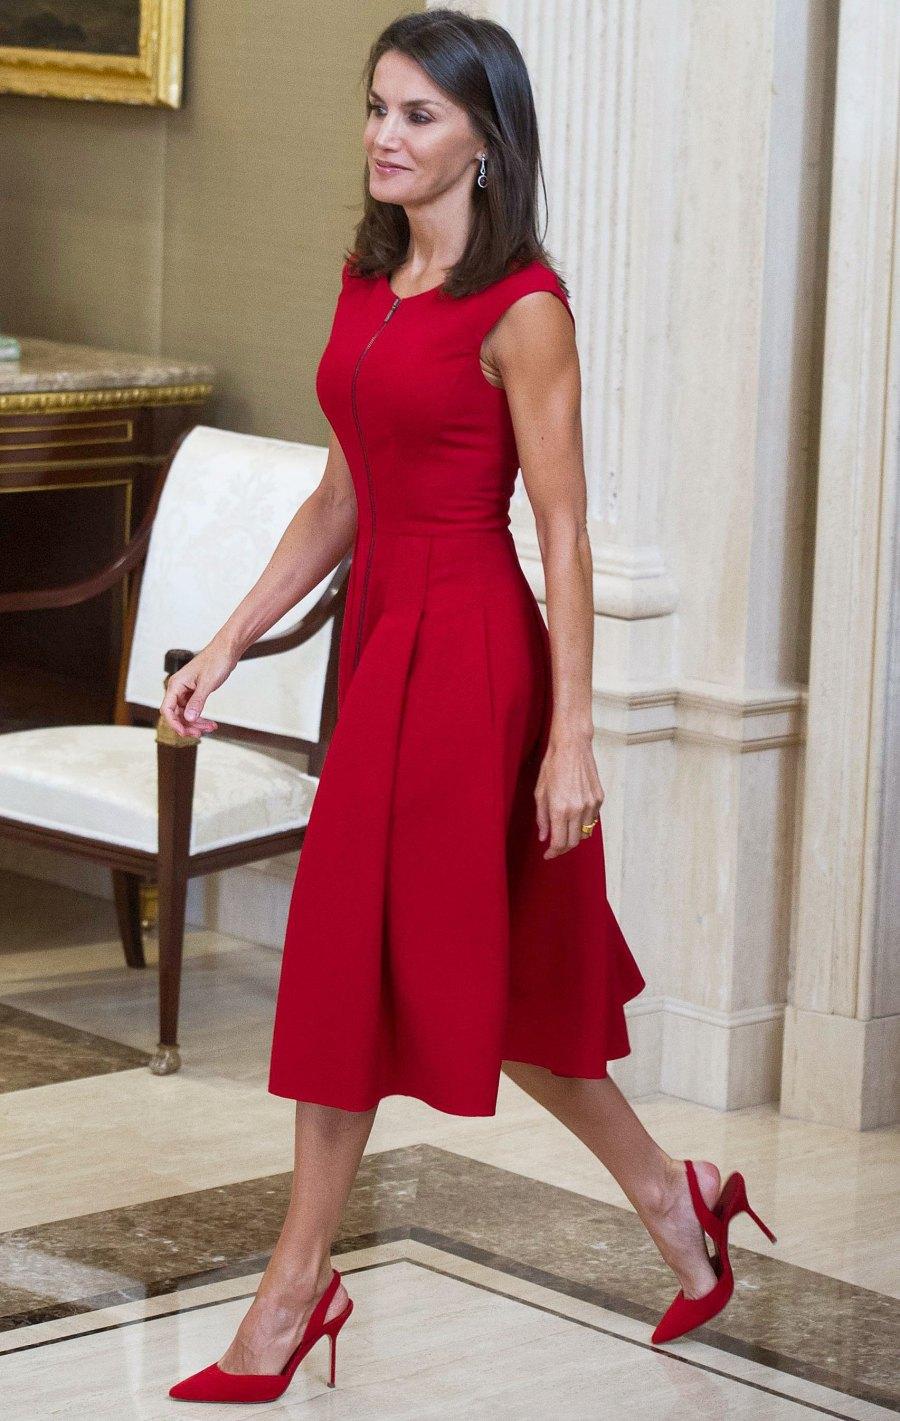 Queen Letizia Red Dress September 16, 2019